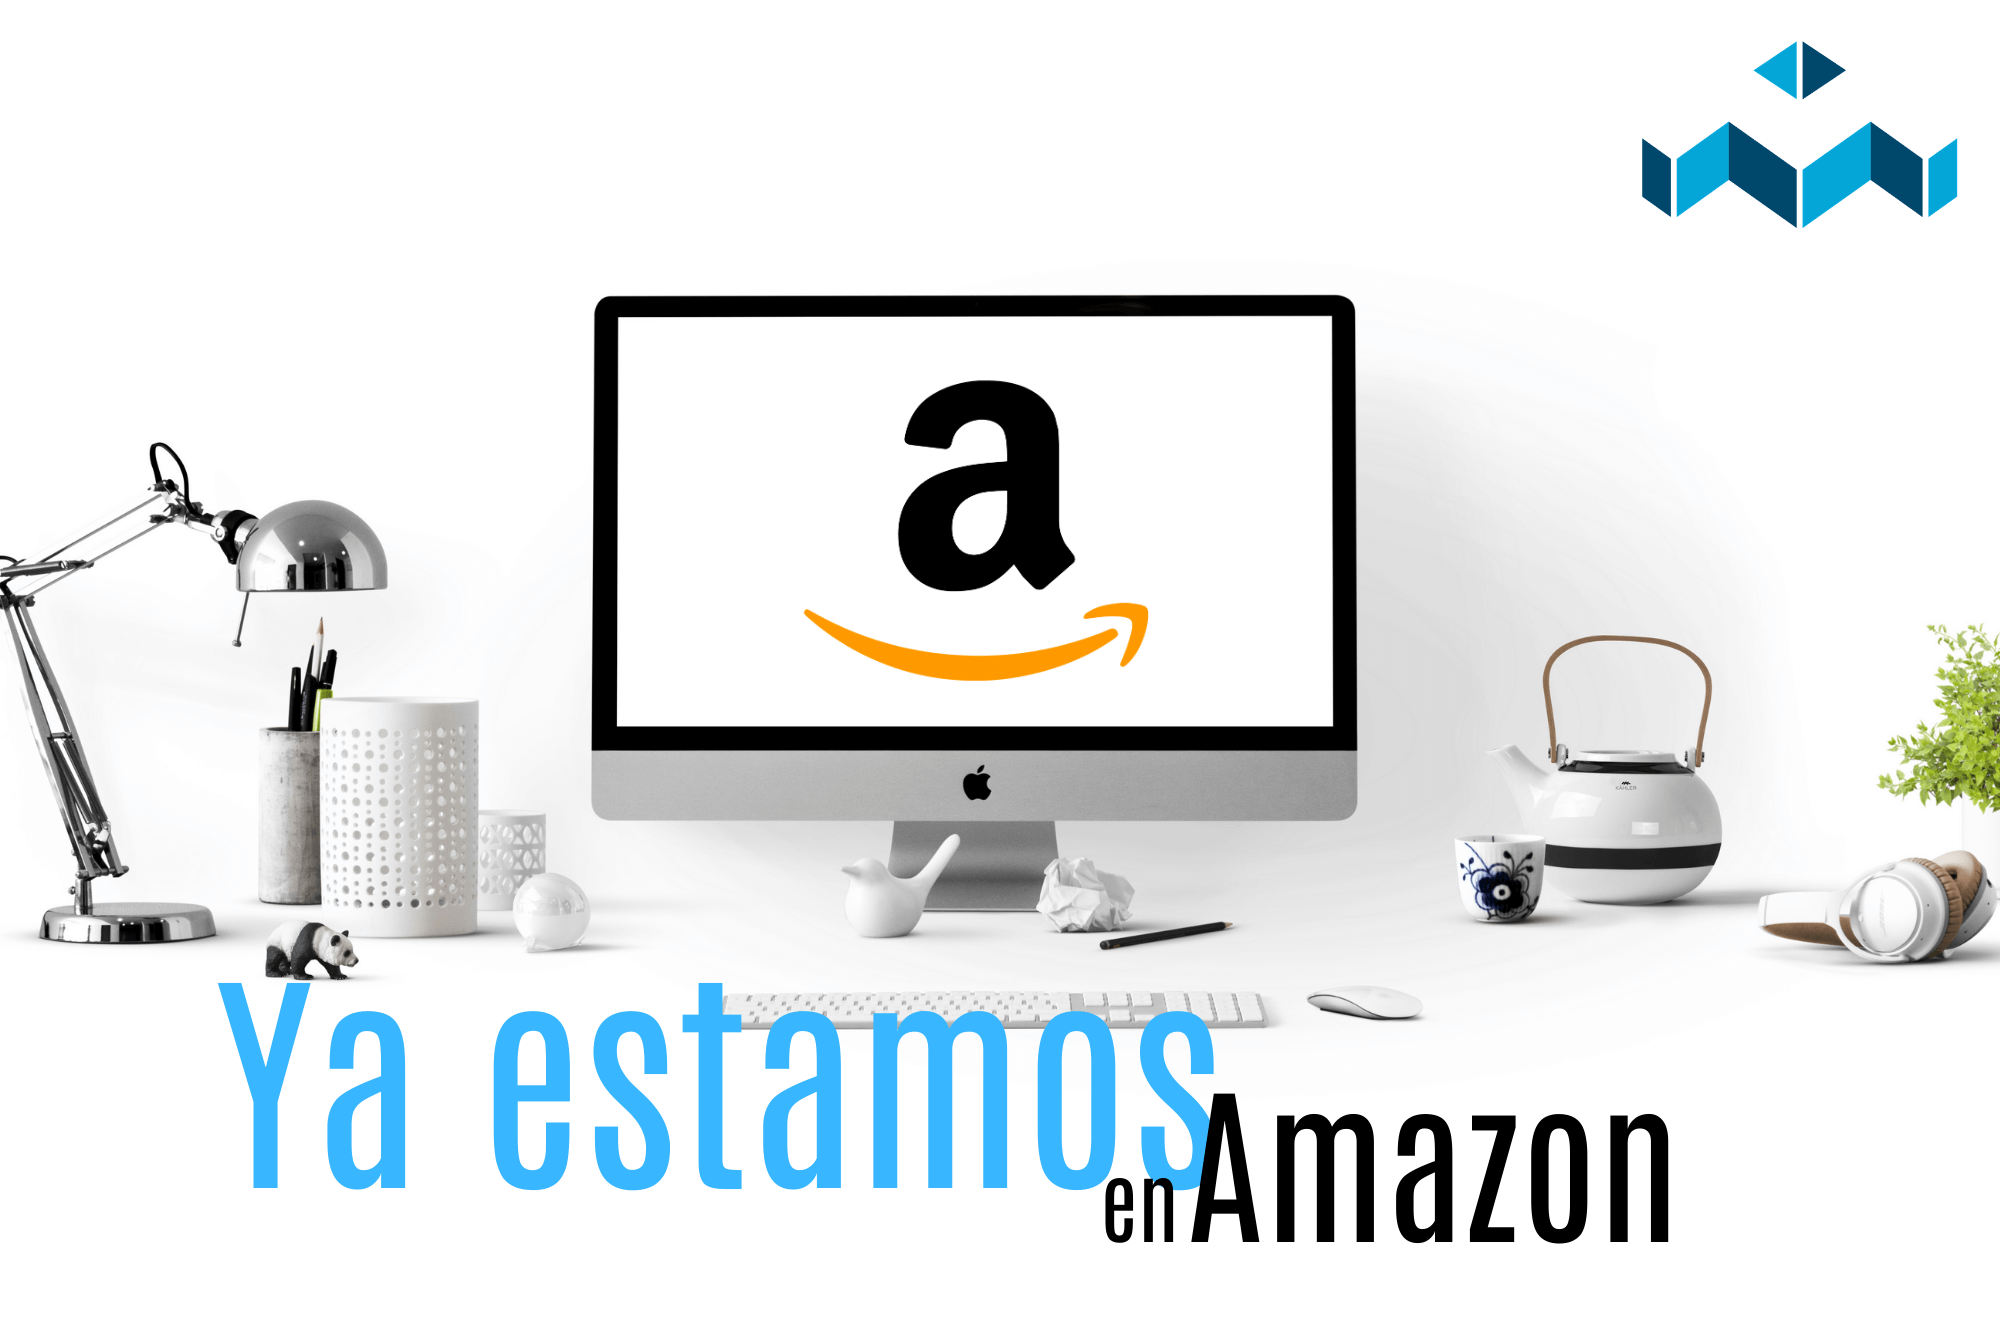 ¡Ya estamos en Amazon!